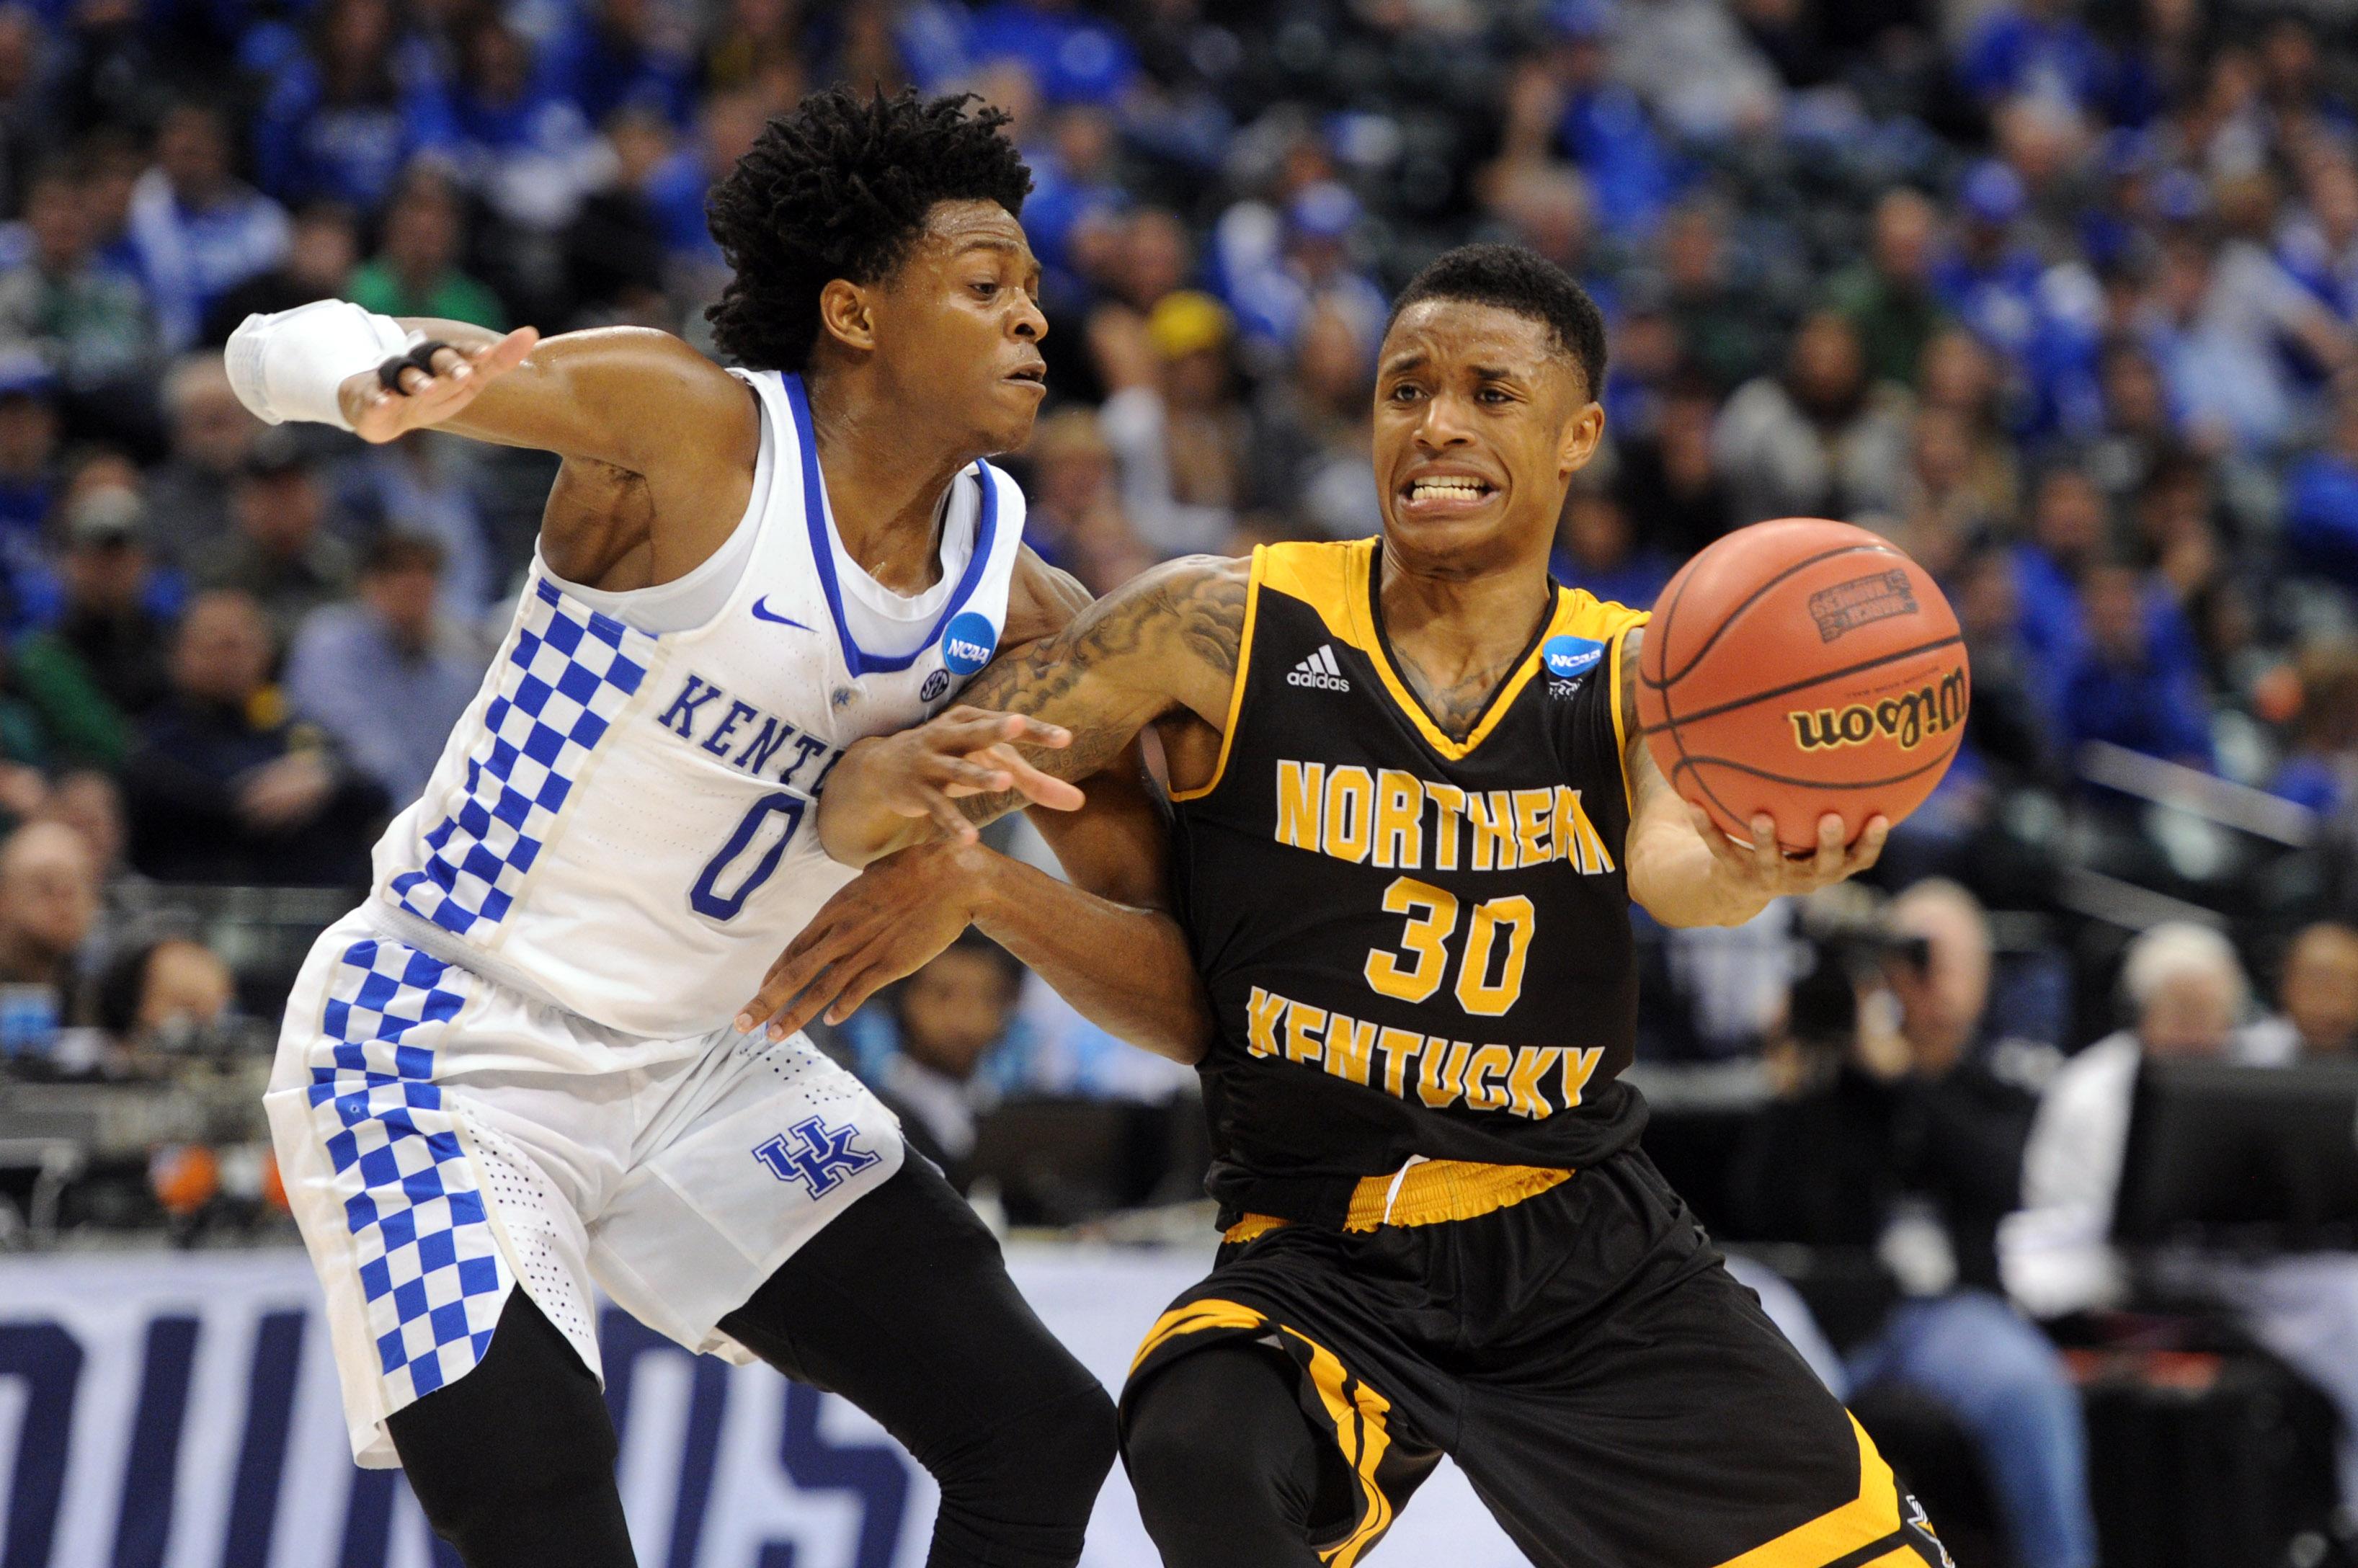 Uk Basketball: Kentucky Basketball Vs Wichita State Shockers: Game Time